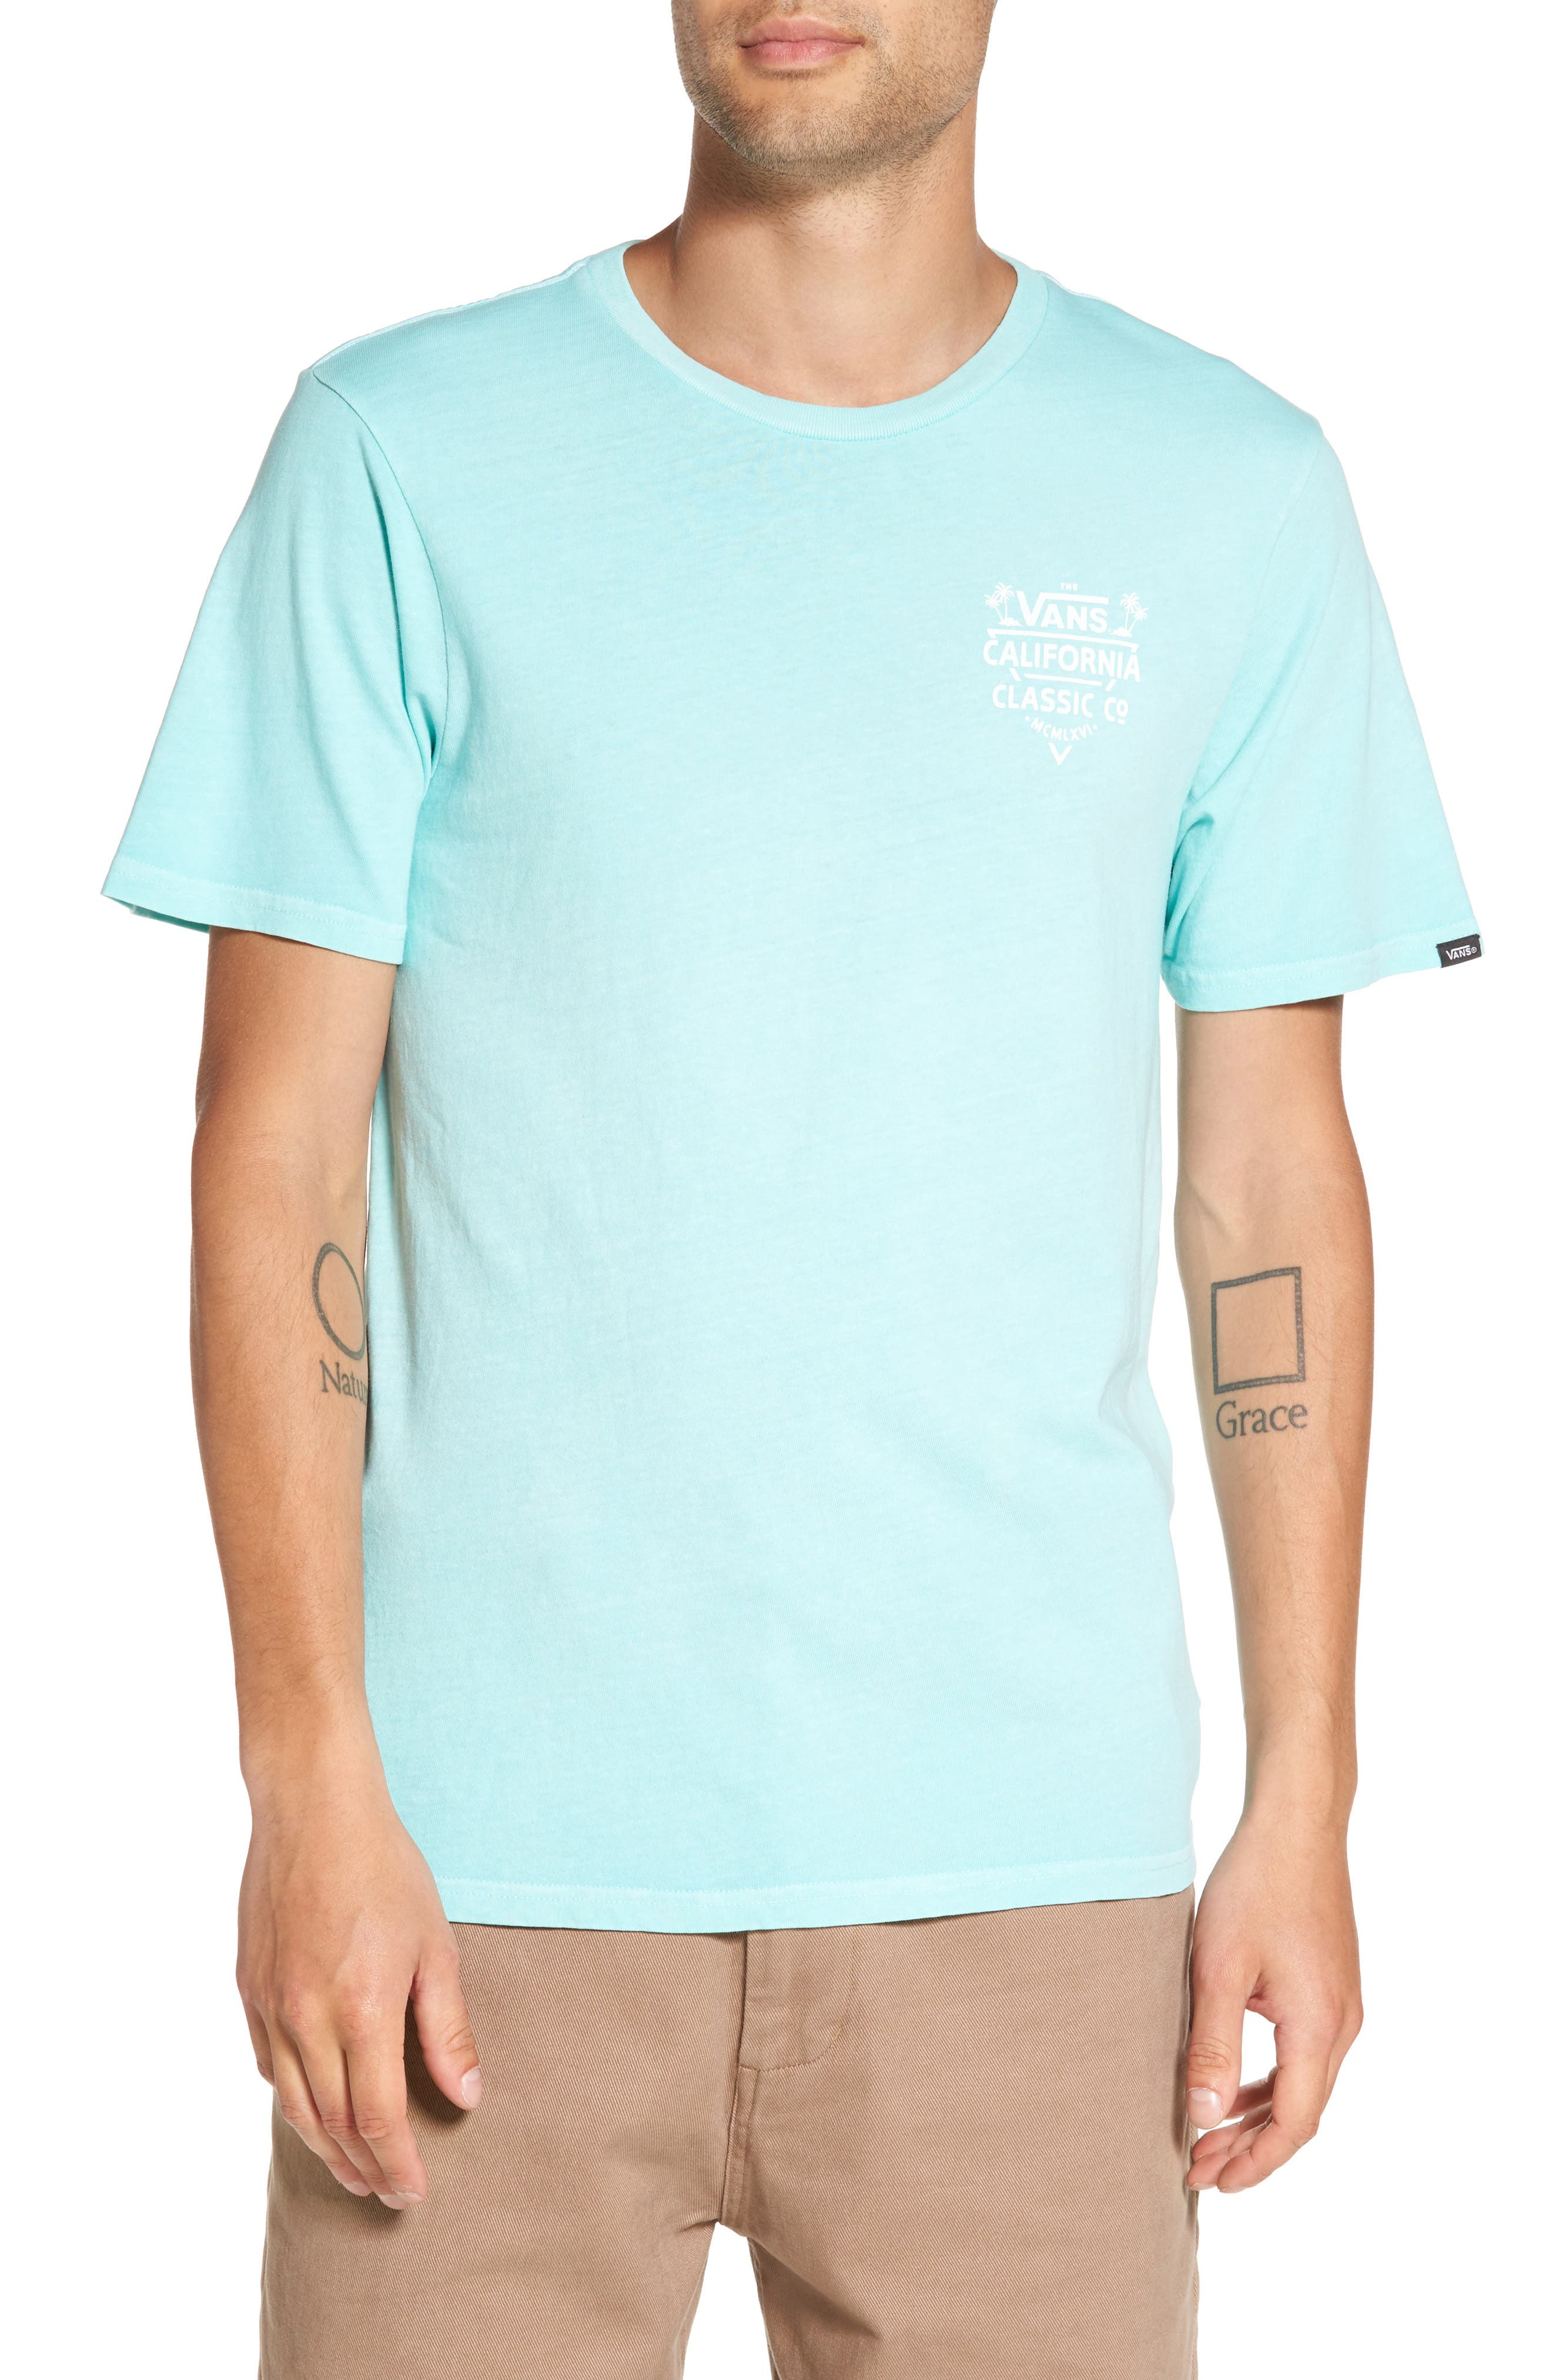 California Classic Co. Overdye T-Shirt,                             Main thumbnail 1, color,                             400